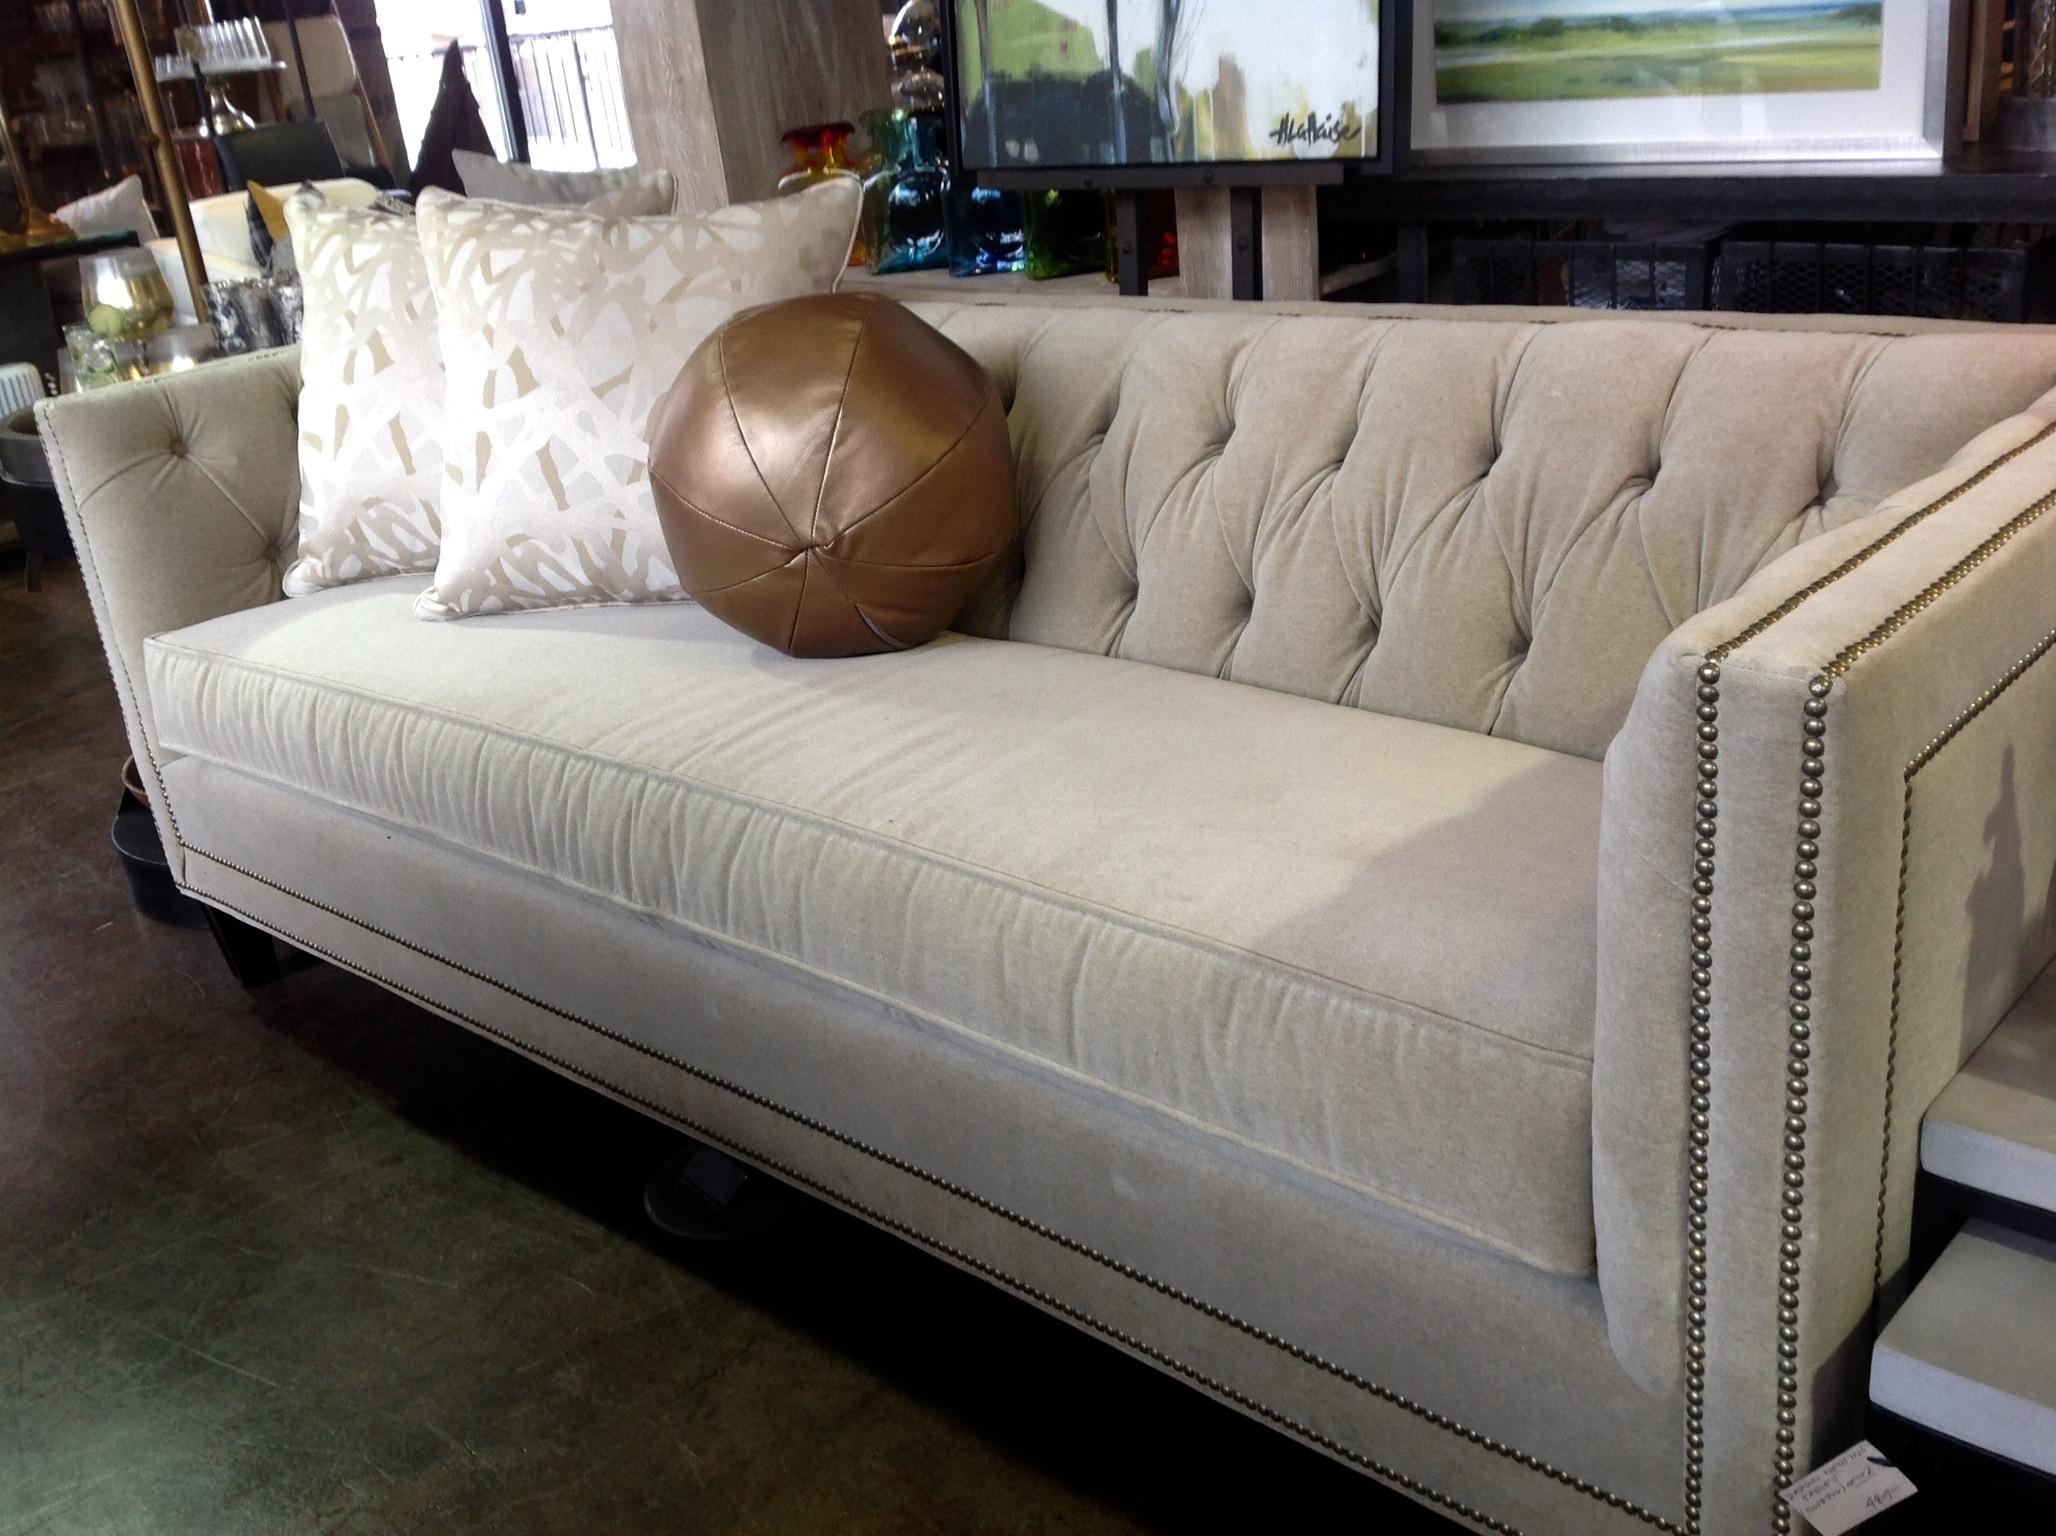 Kaden Sofa   Lulu's Furniture & Decor Regarding Norwalk Sofas (Photo 7 of 10)